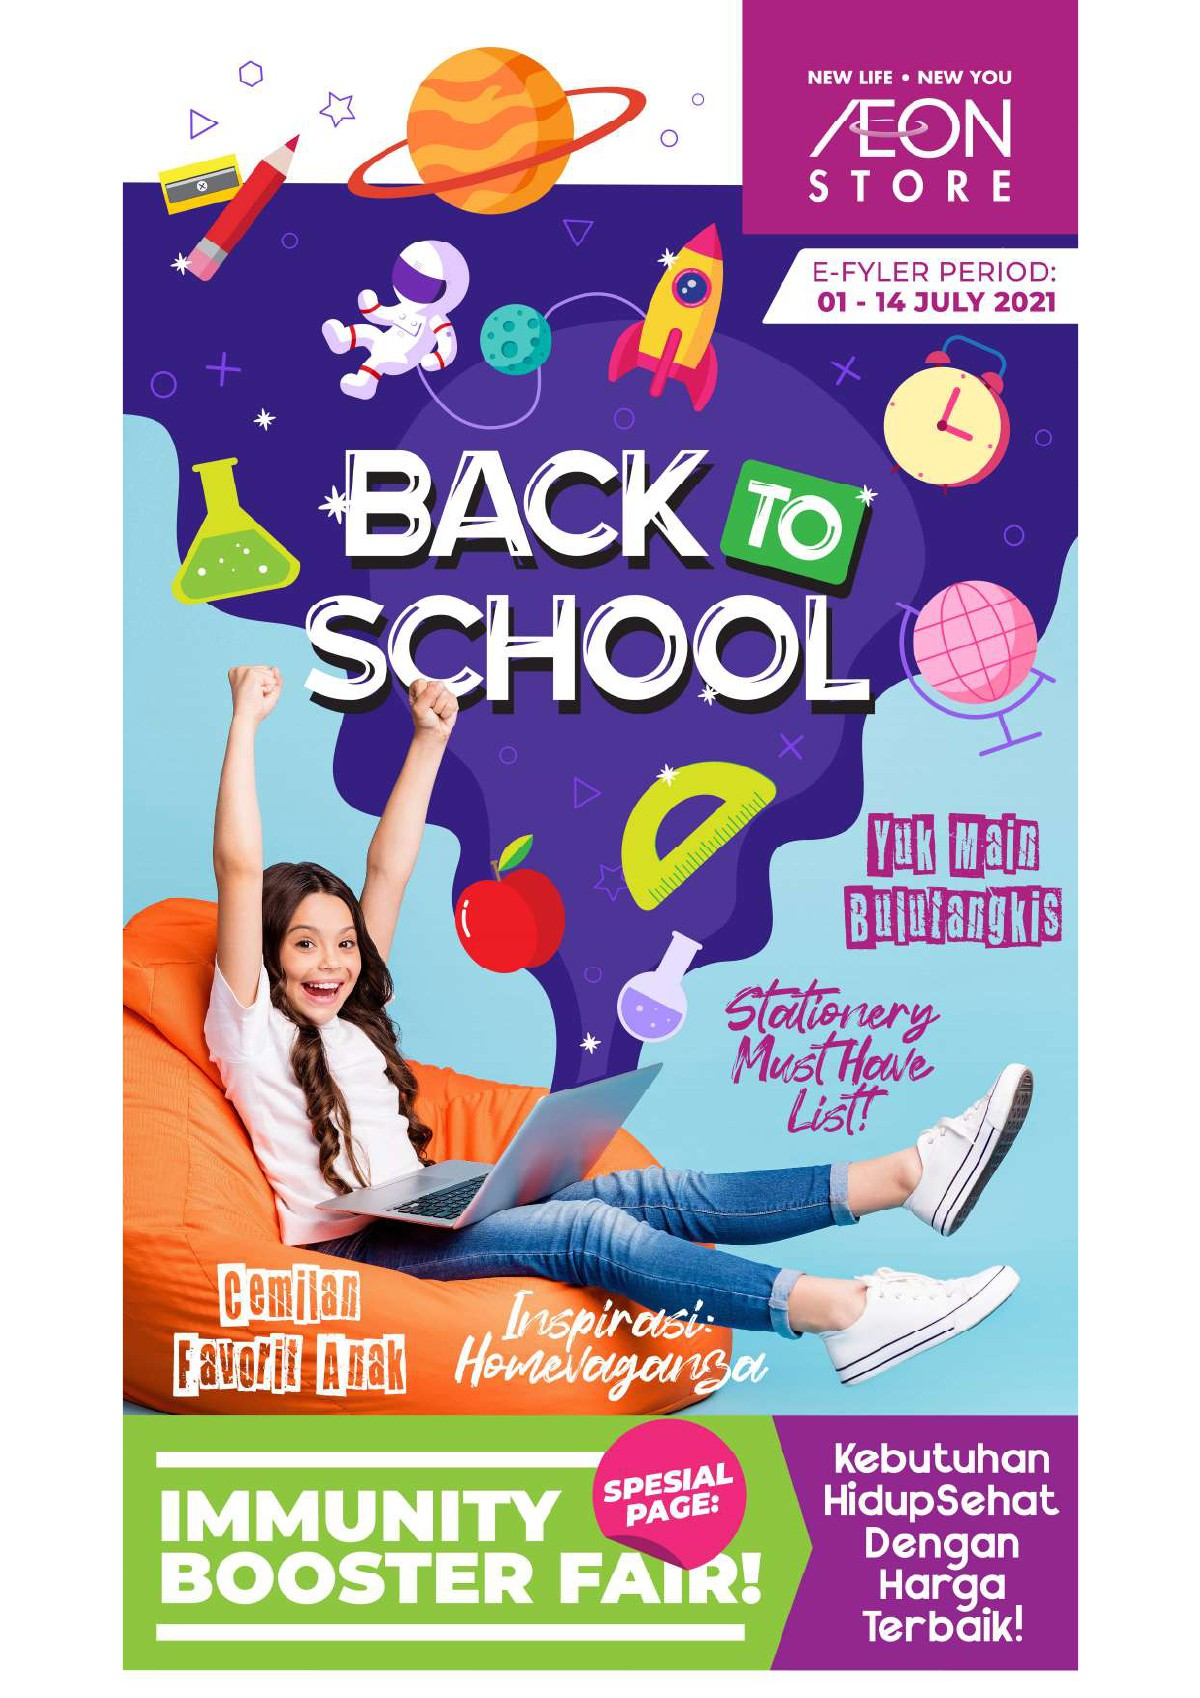 Katalog Promo Aeon Store Indonesia periode 01-14 Juli 2021